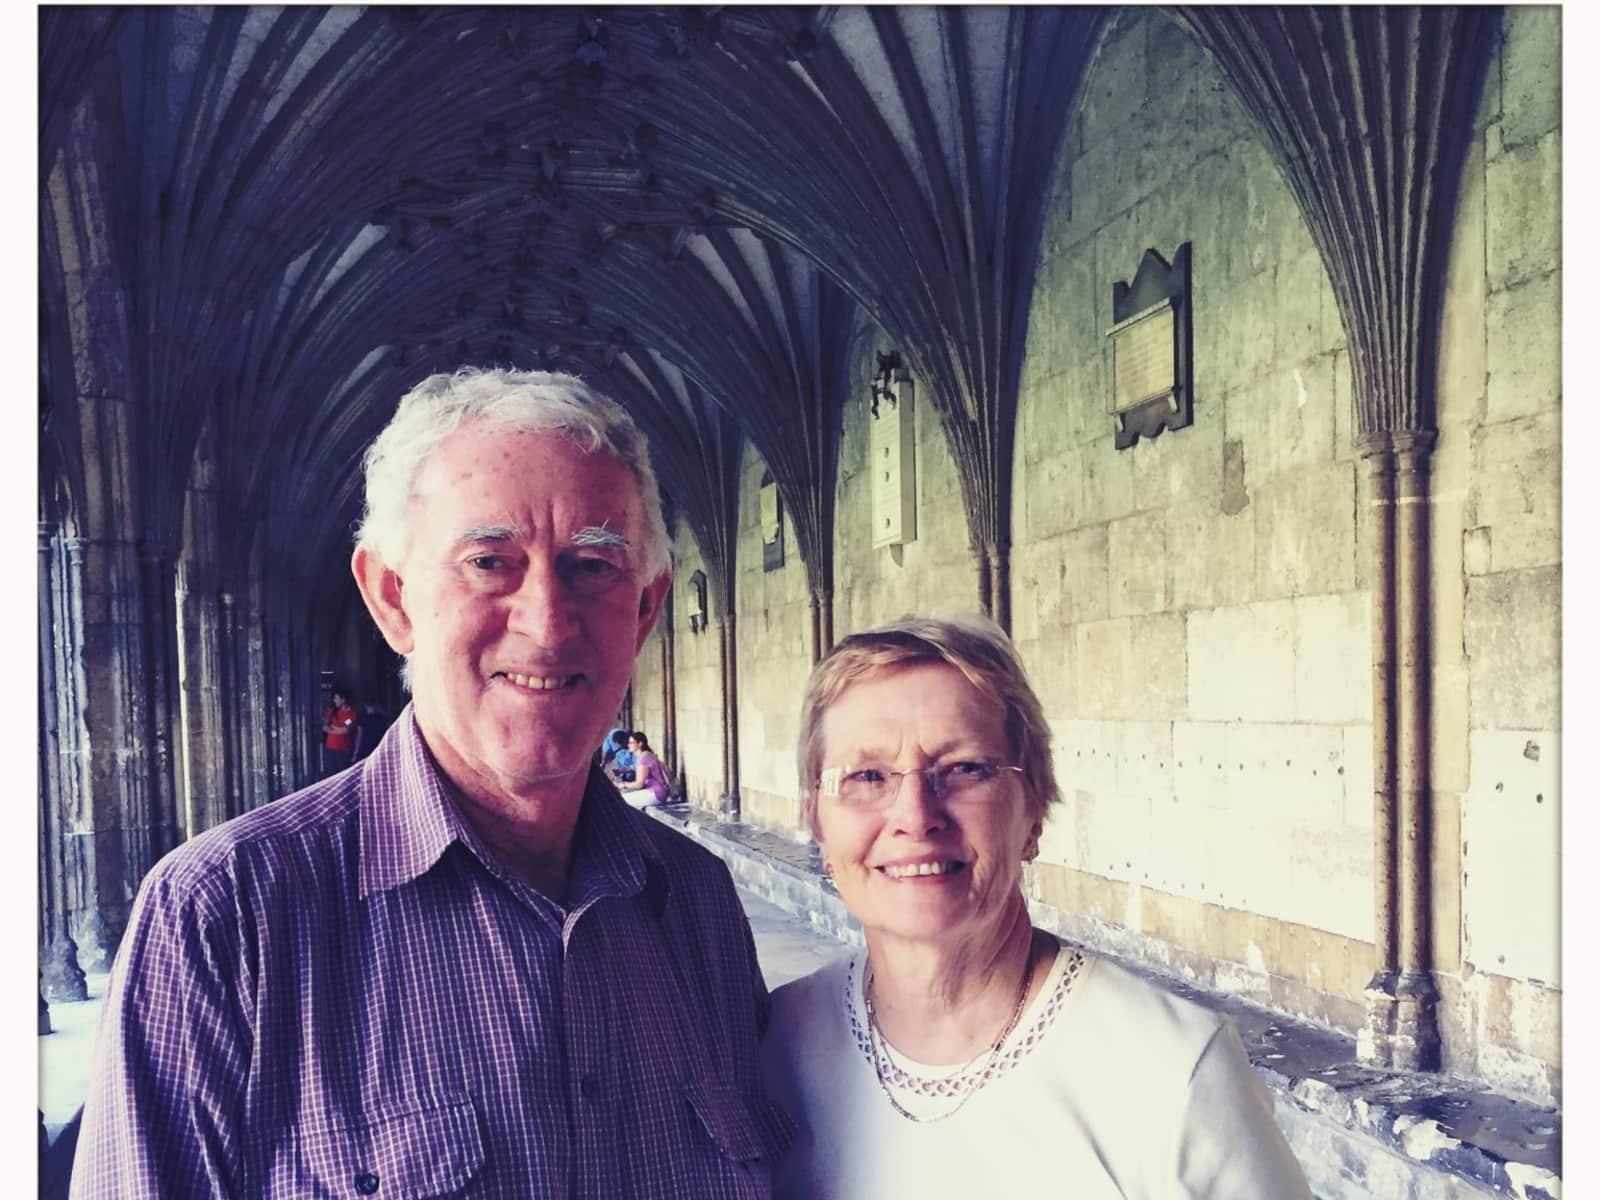 Carolyn & Ross from Margaret River, Western Australia, Australia